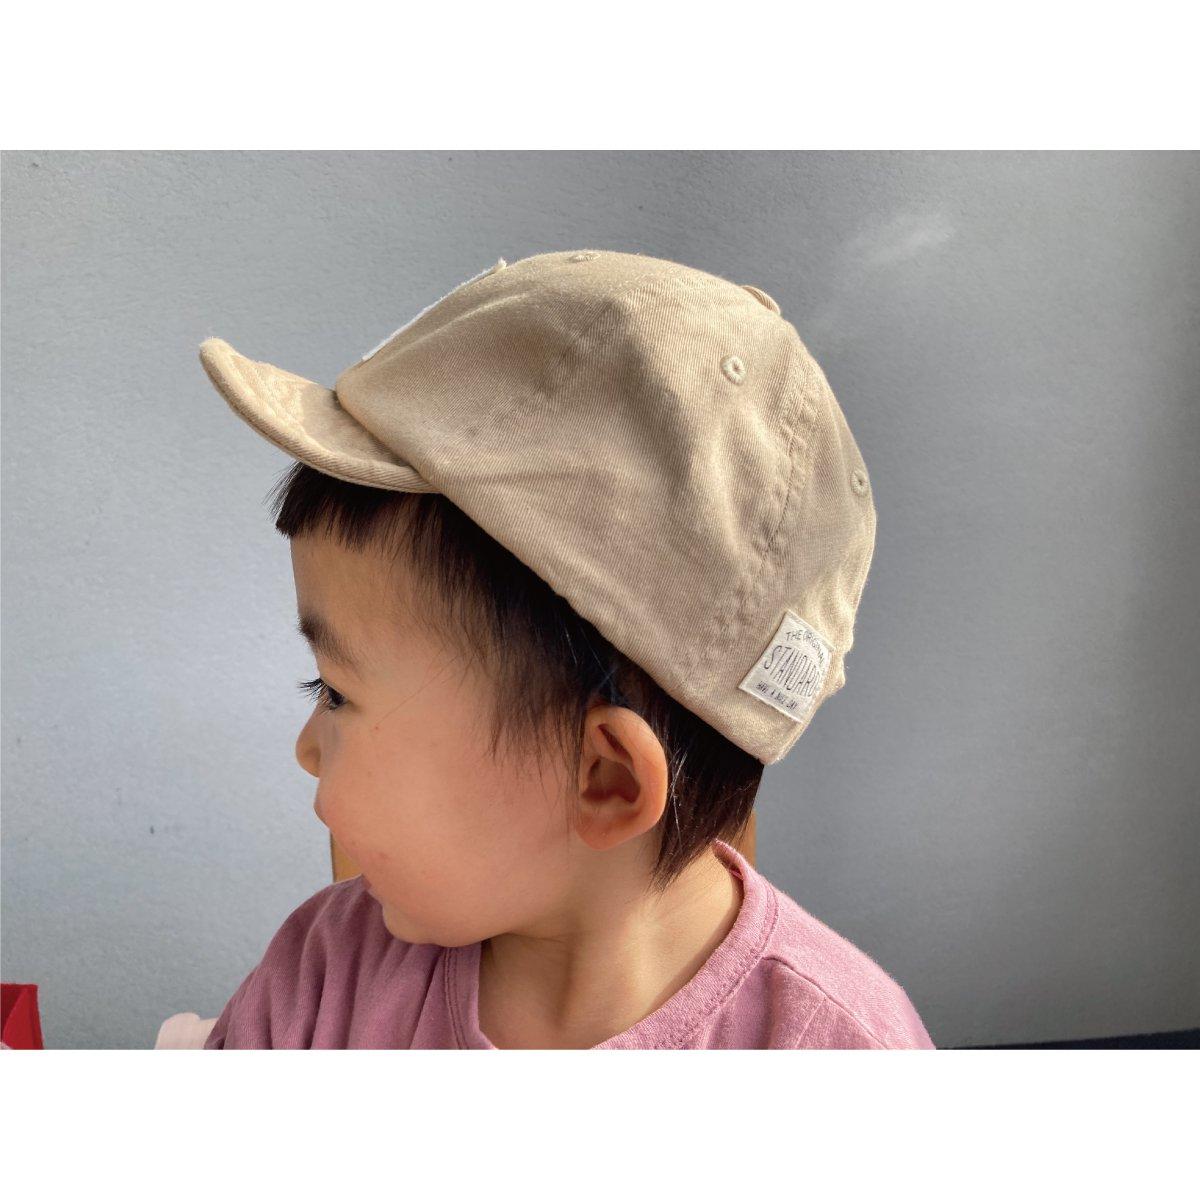 【KIDS】Kids Sim Logo Cap 詳細画像39